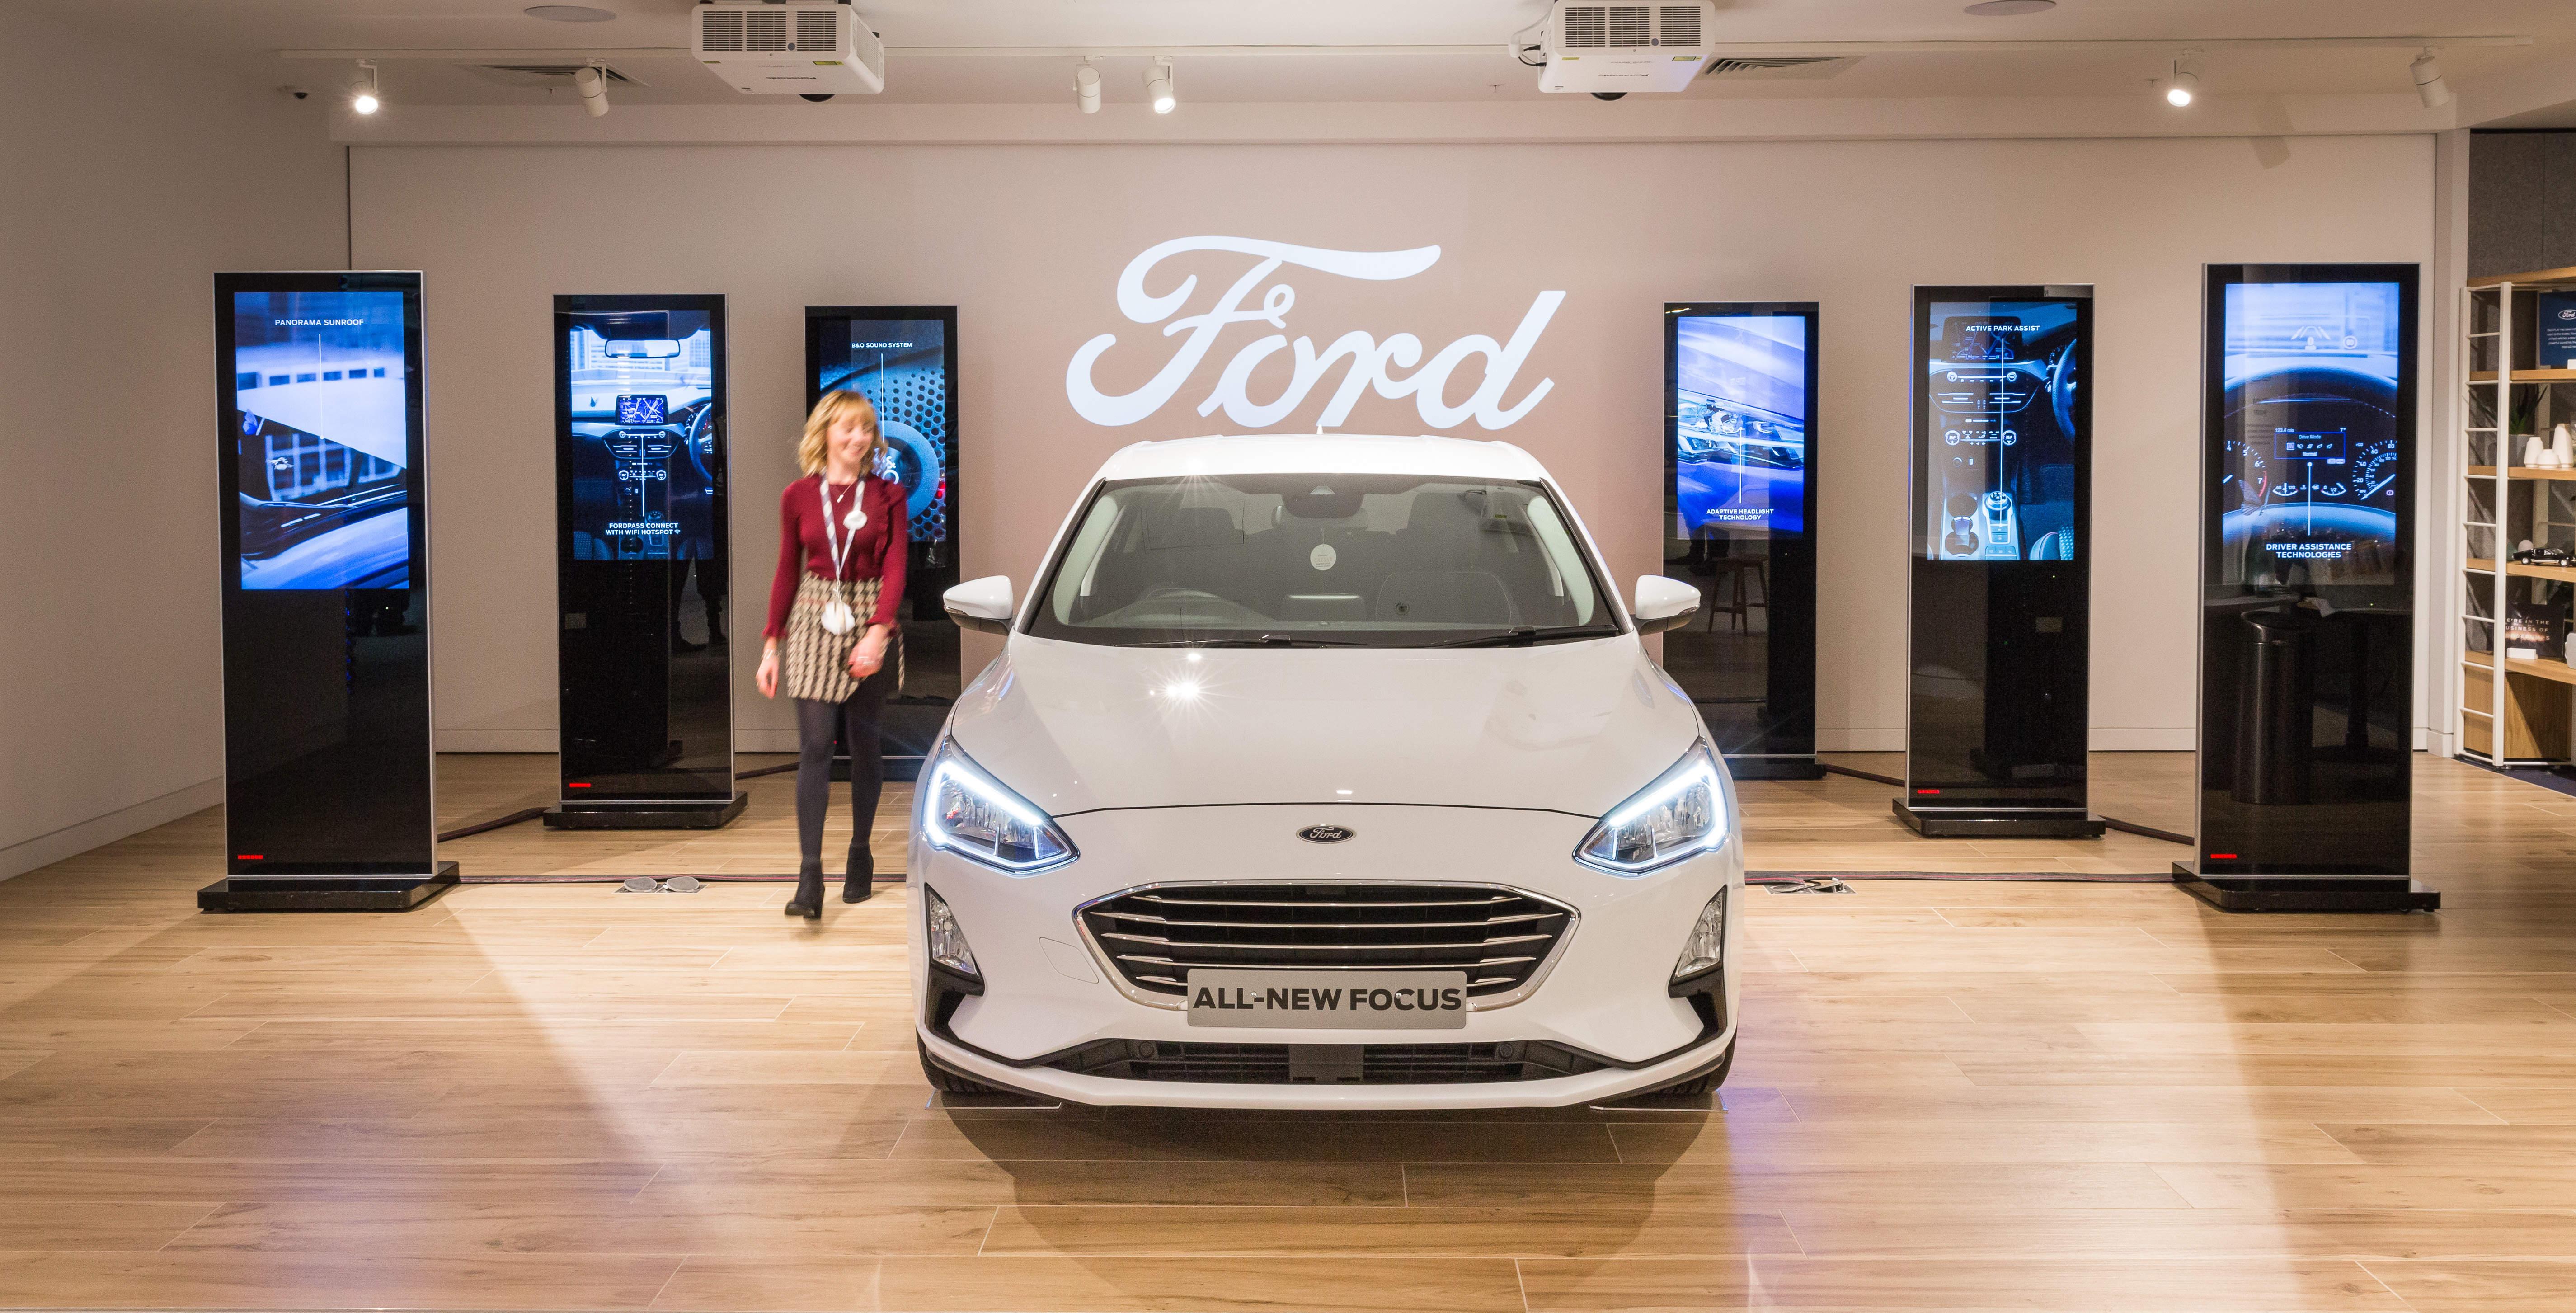 Ford overhauls executive posts across Europe